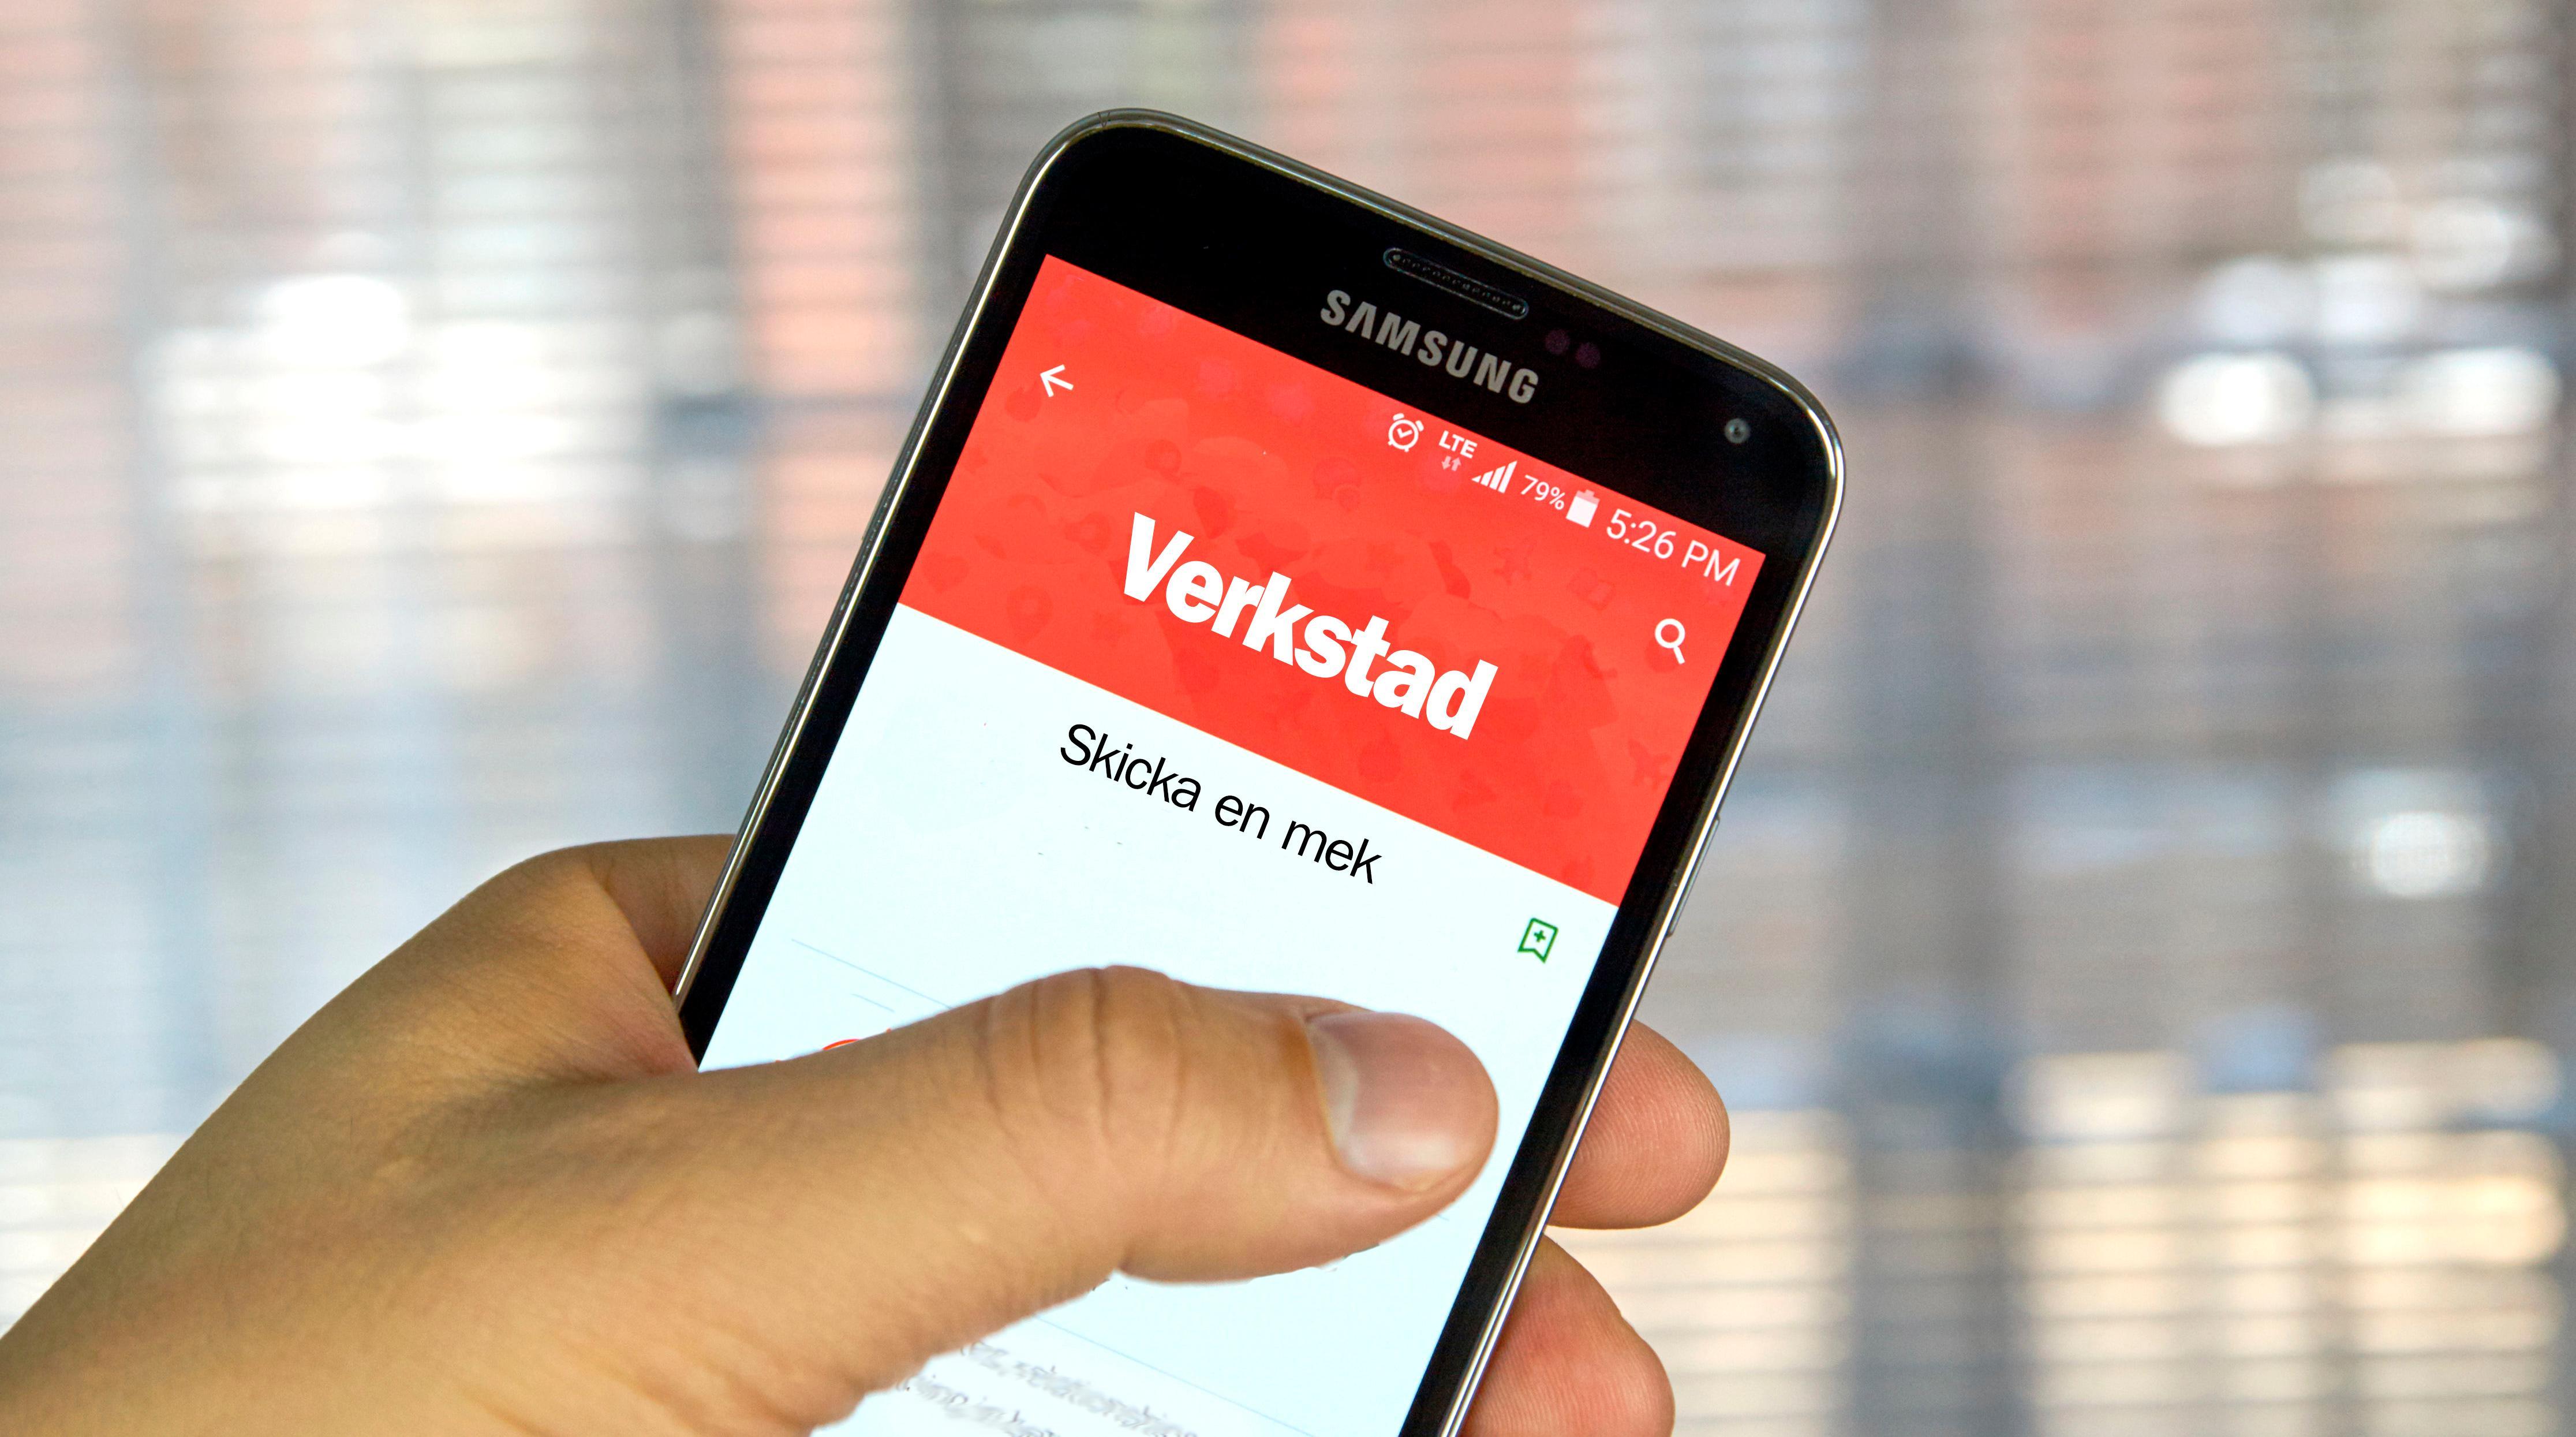 Snapchat eskort liten i upplands vsby sex dating sites that